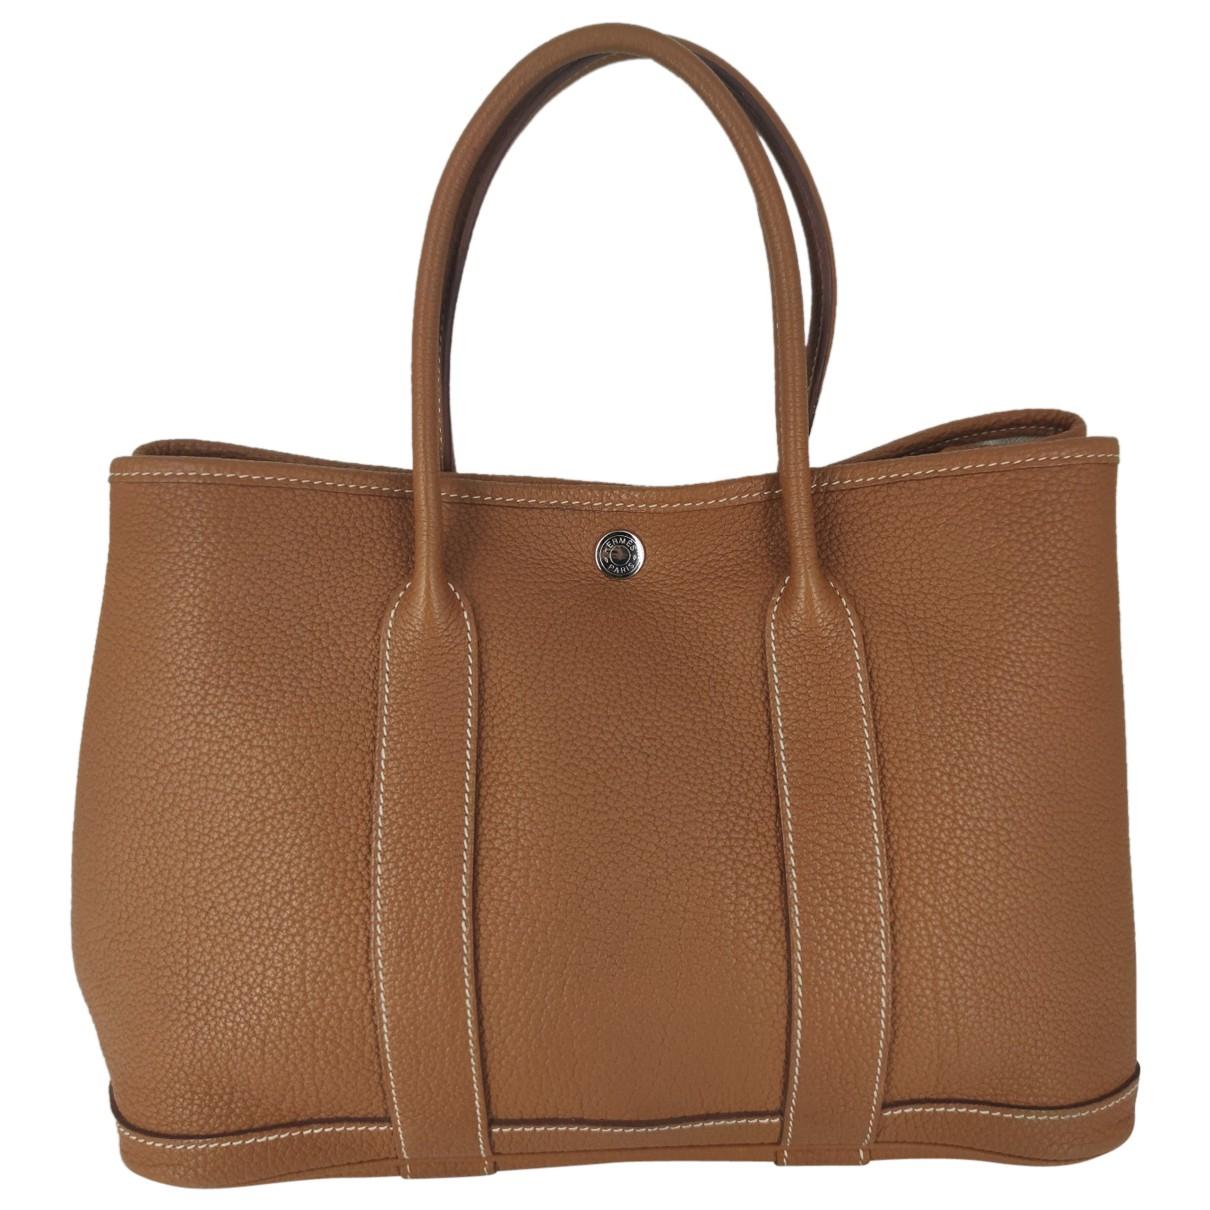 Hermes - Sac a main Garden Party pour femme en cuir - marron